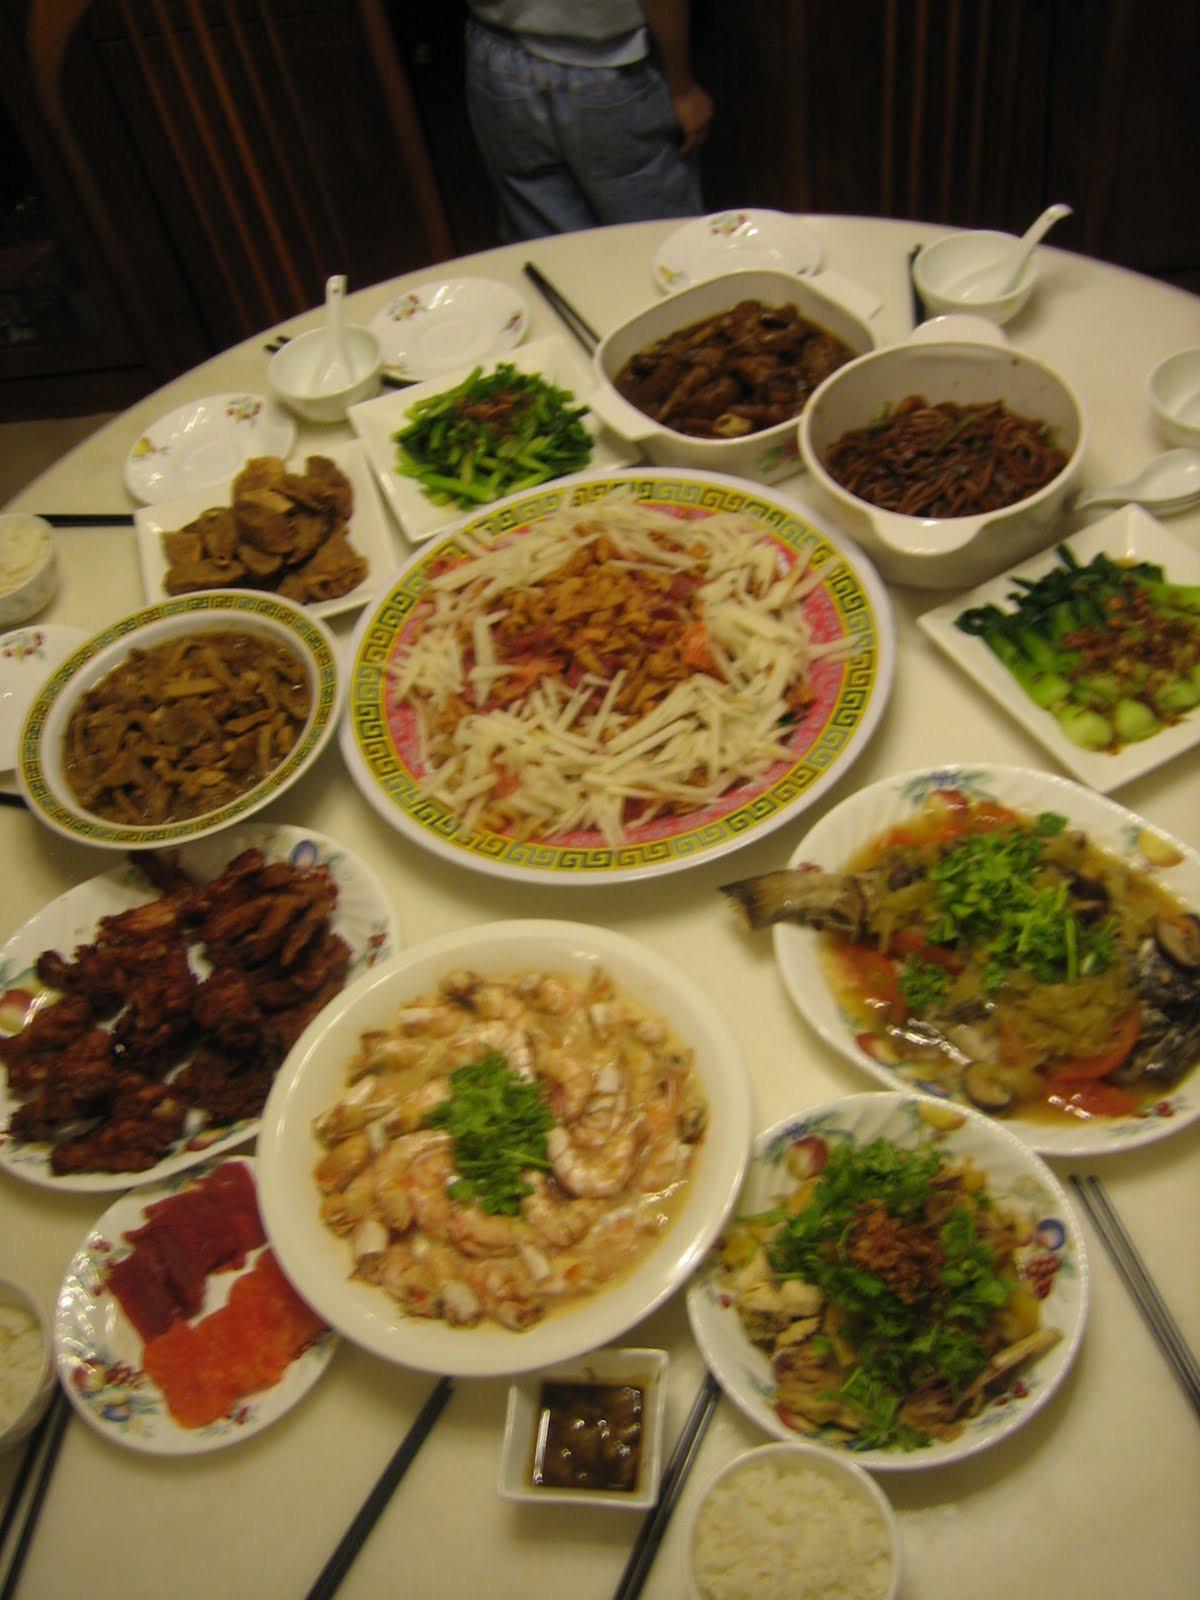 New Year Dinner  Apprentice Chef 2010 Chinese New Year Reunion Dinner Menu